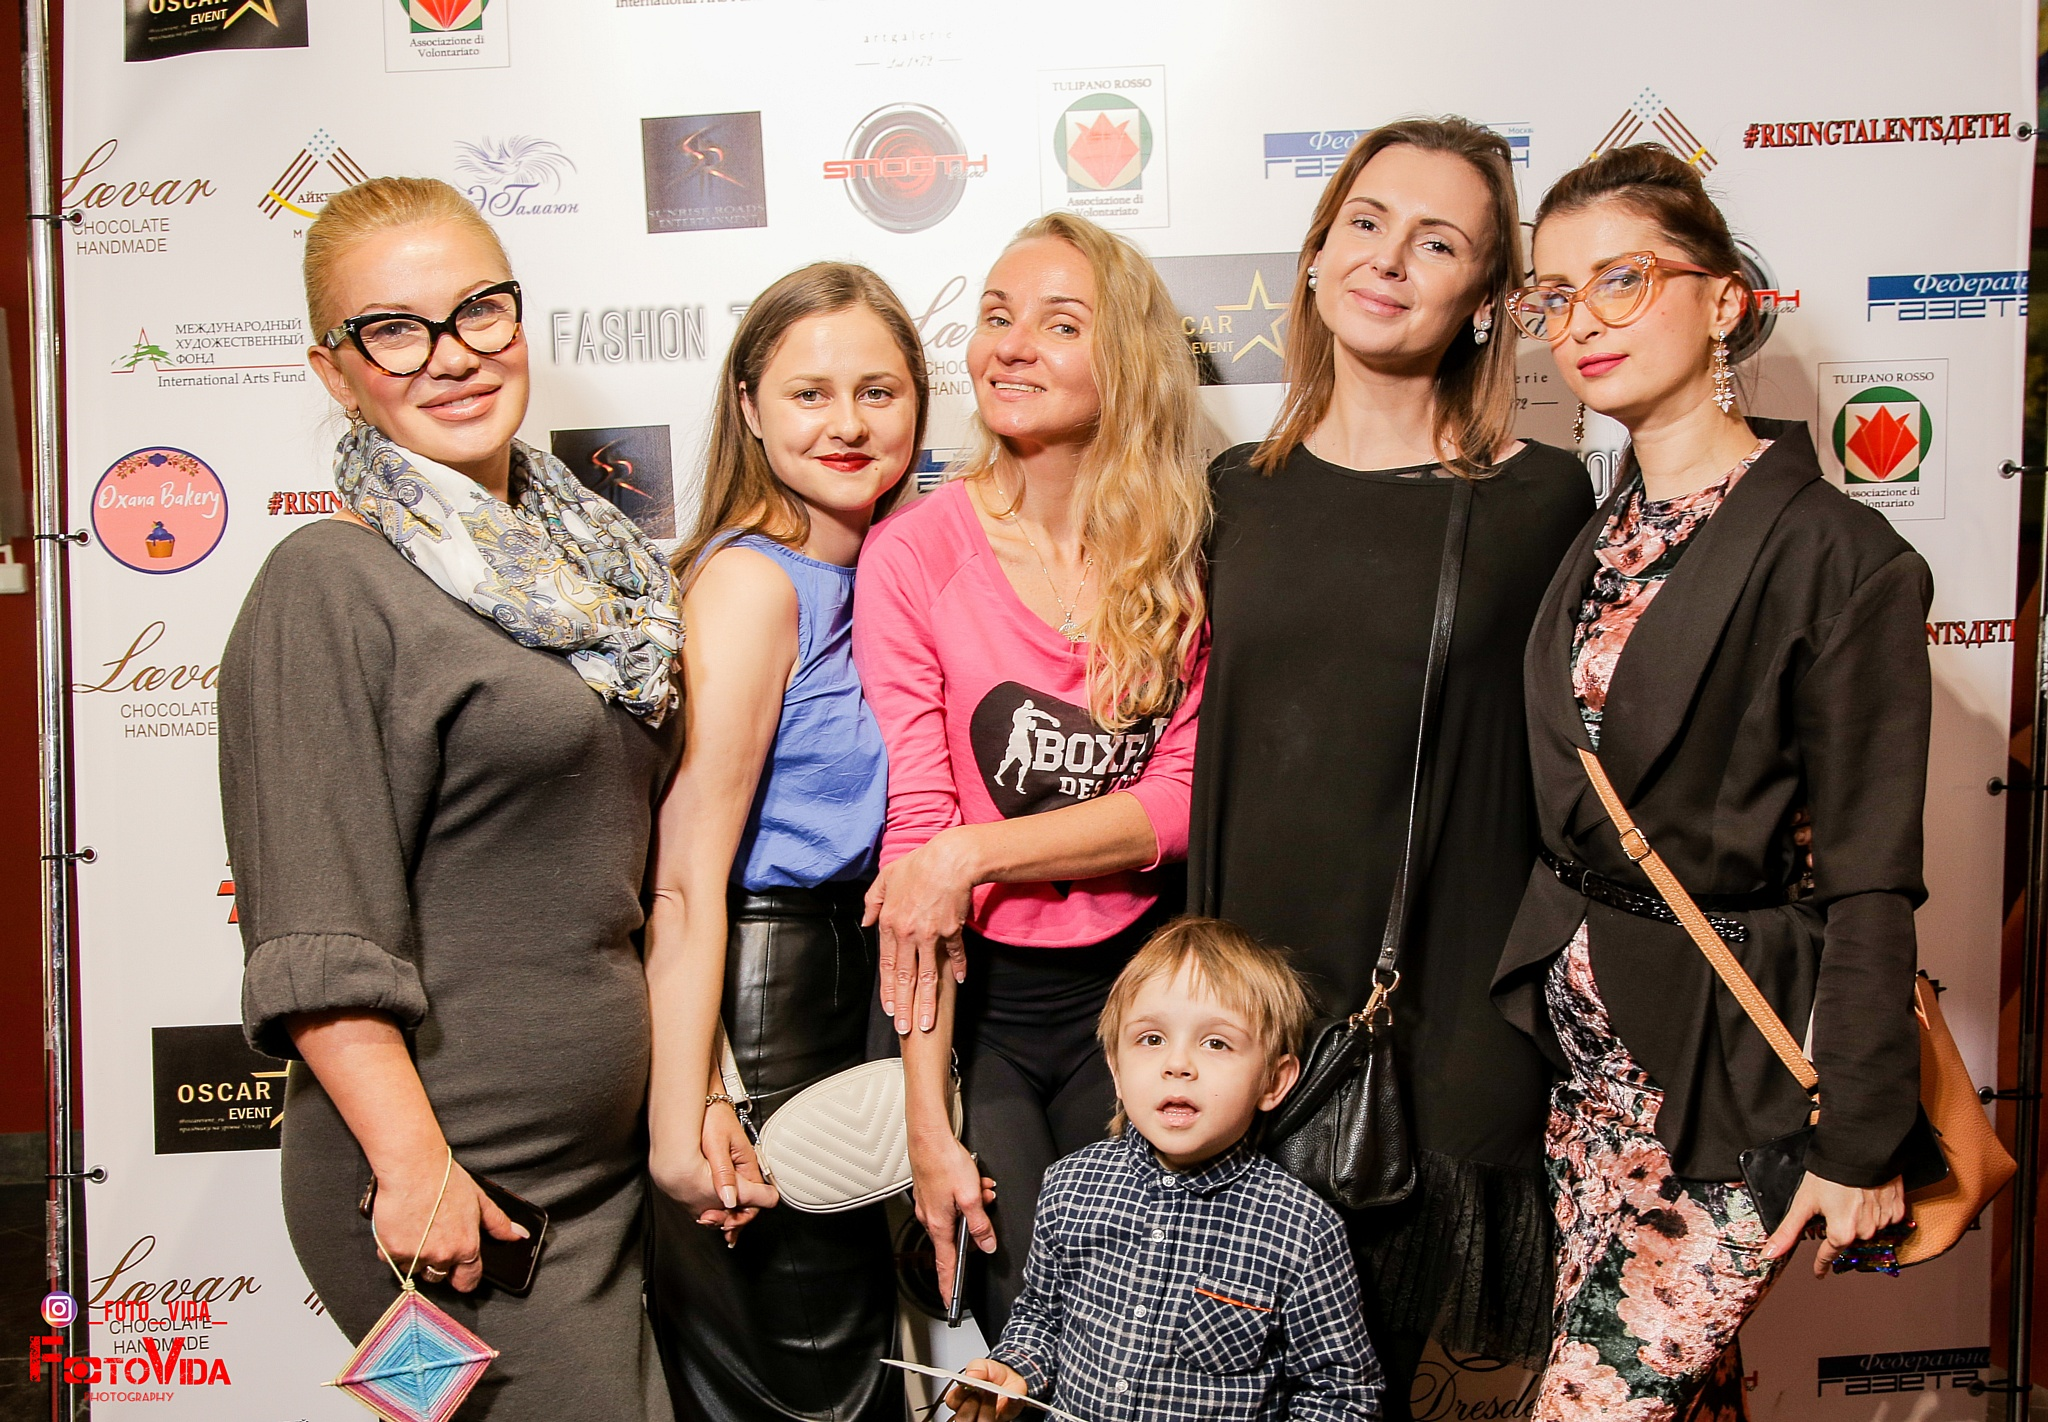 Международный арт-фестиваль «Краски жизни» - яркий спектр эмоций